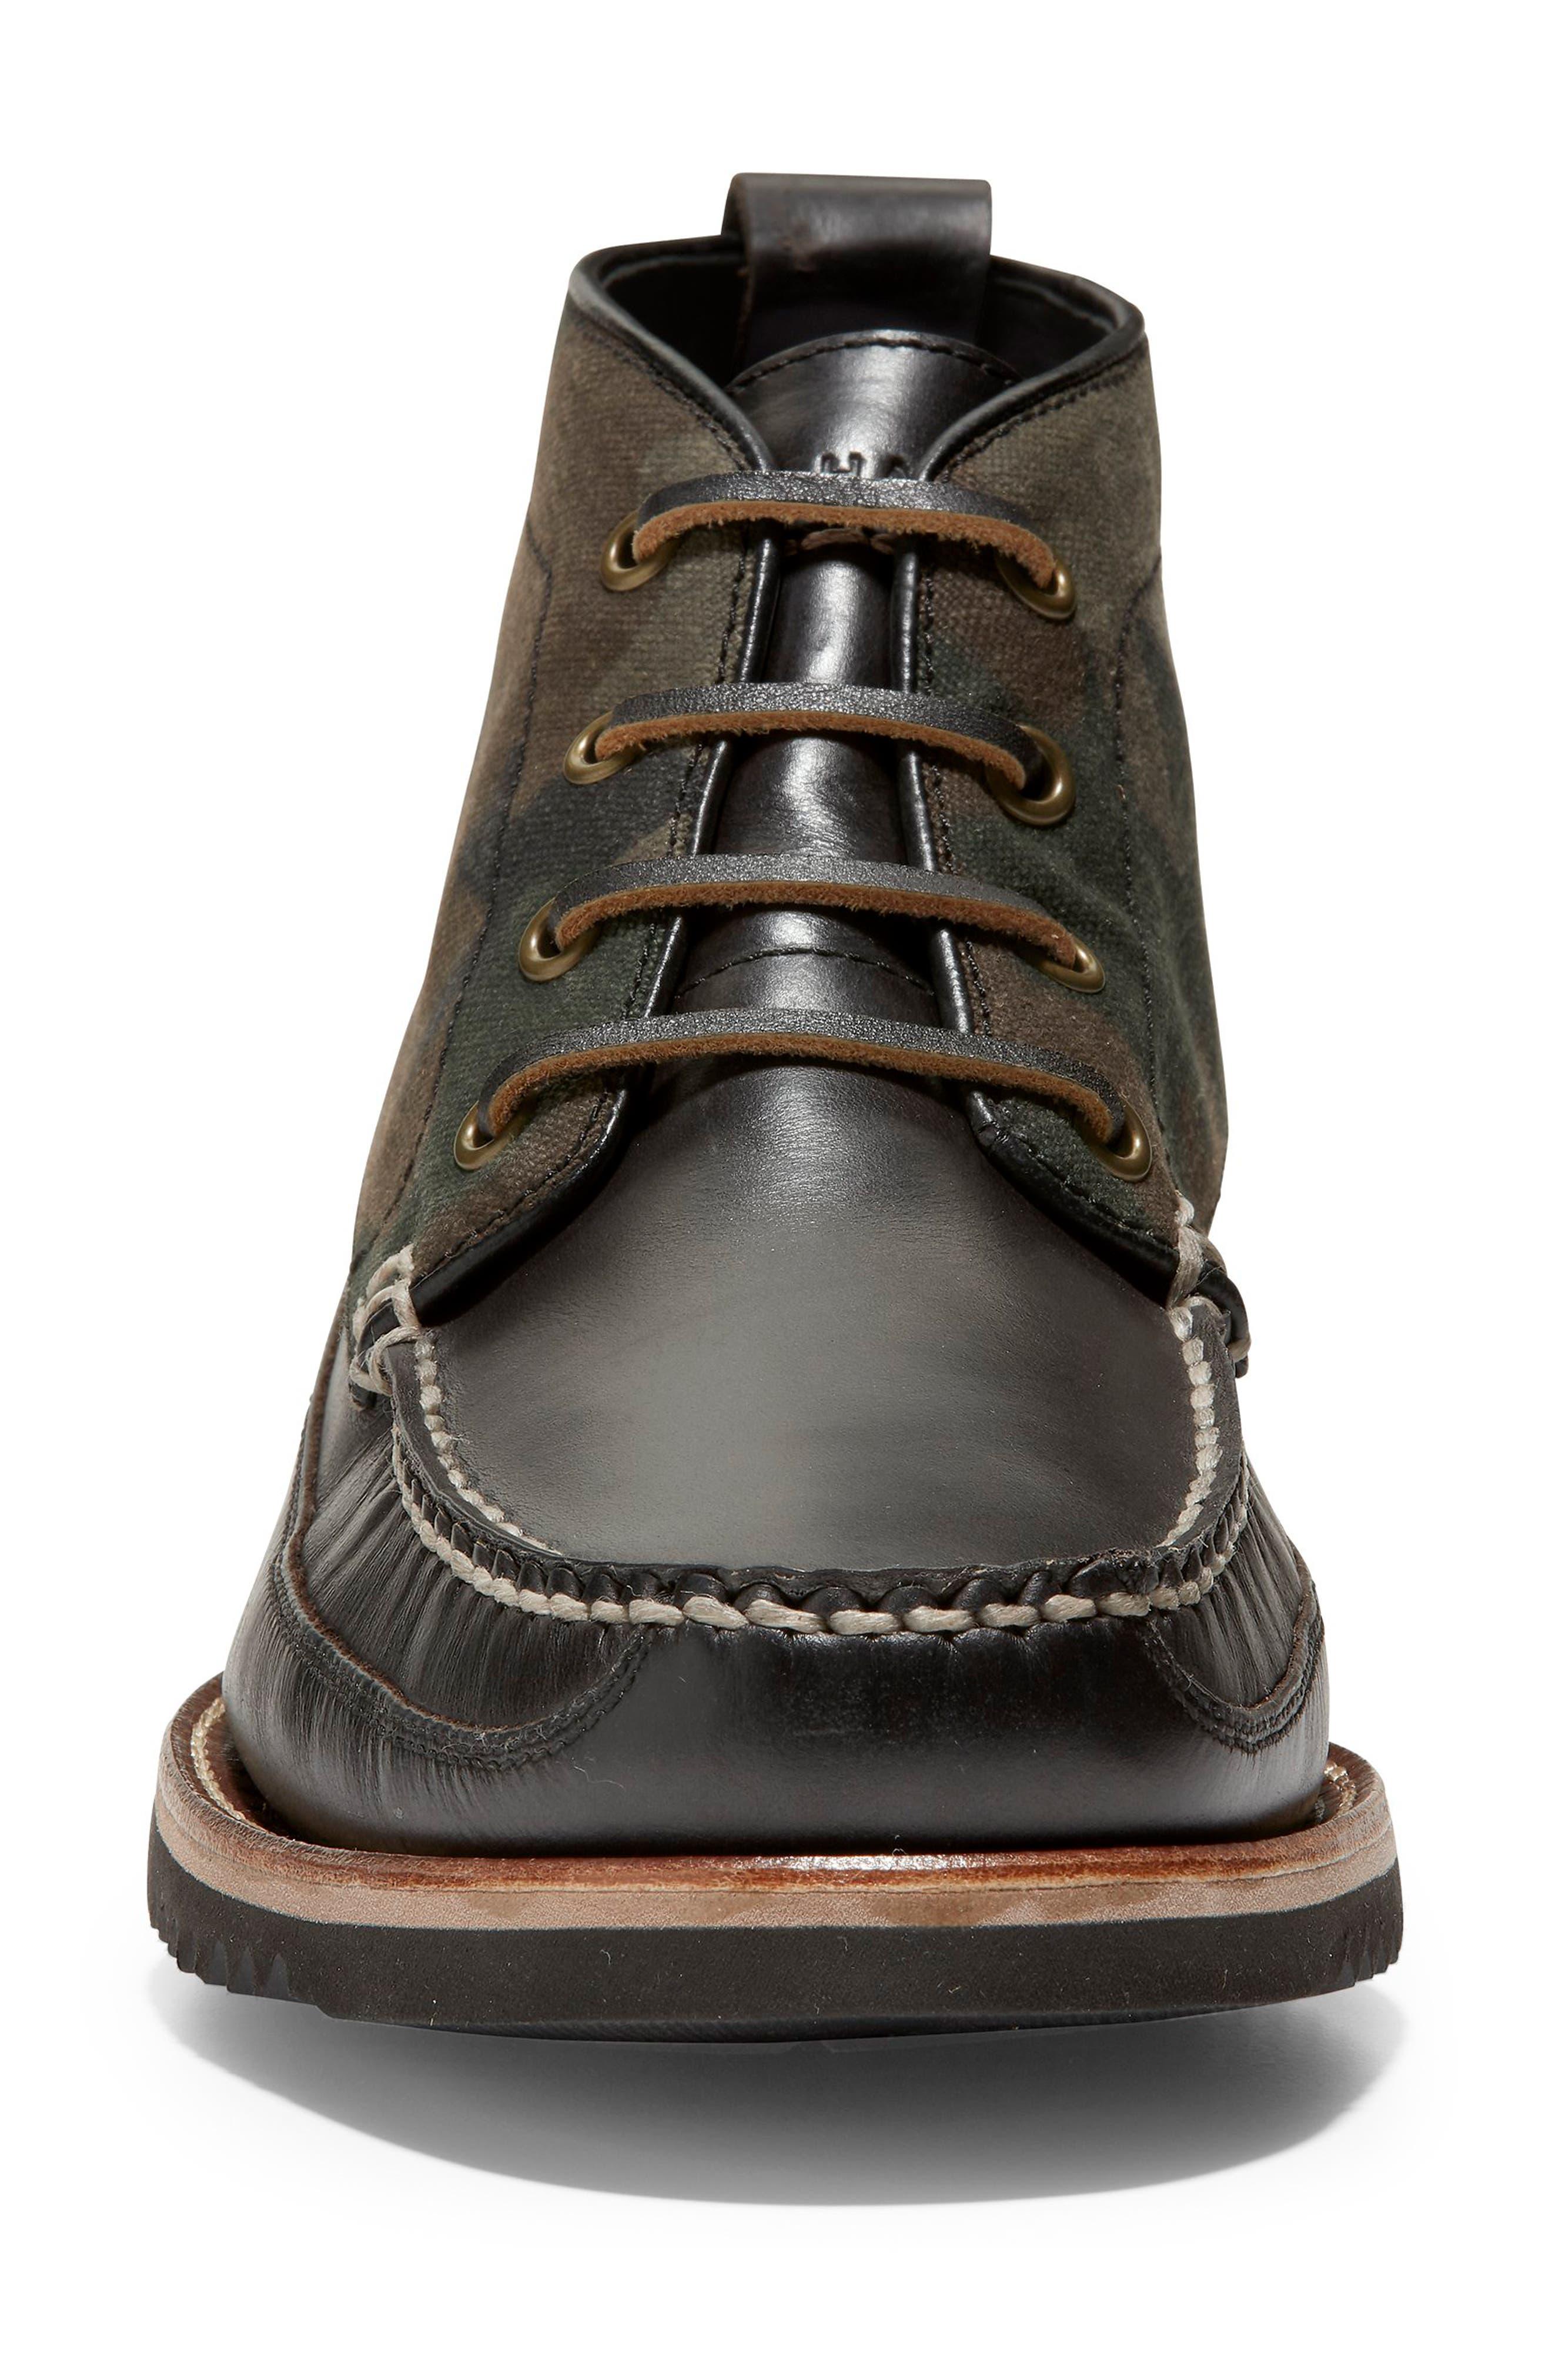 Pinch Moc Toe Boot,                             Alternate thumbnail 4, color,                             CAMO CAVAS